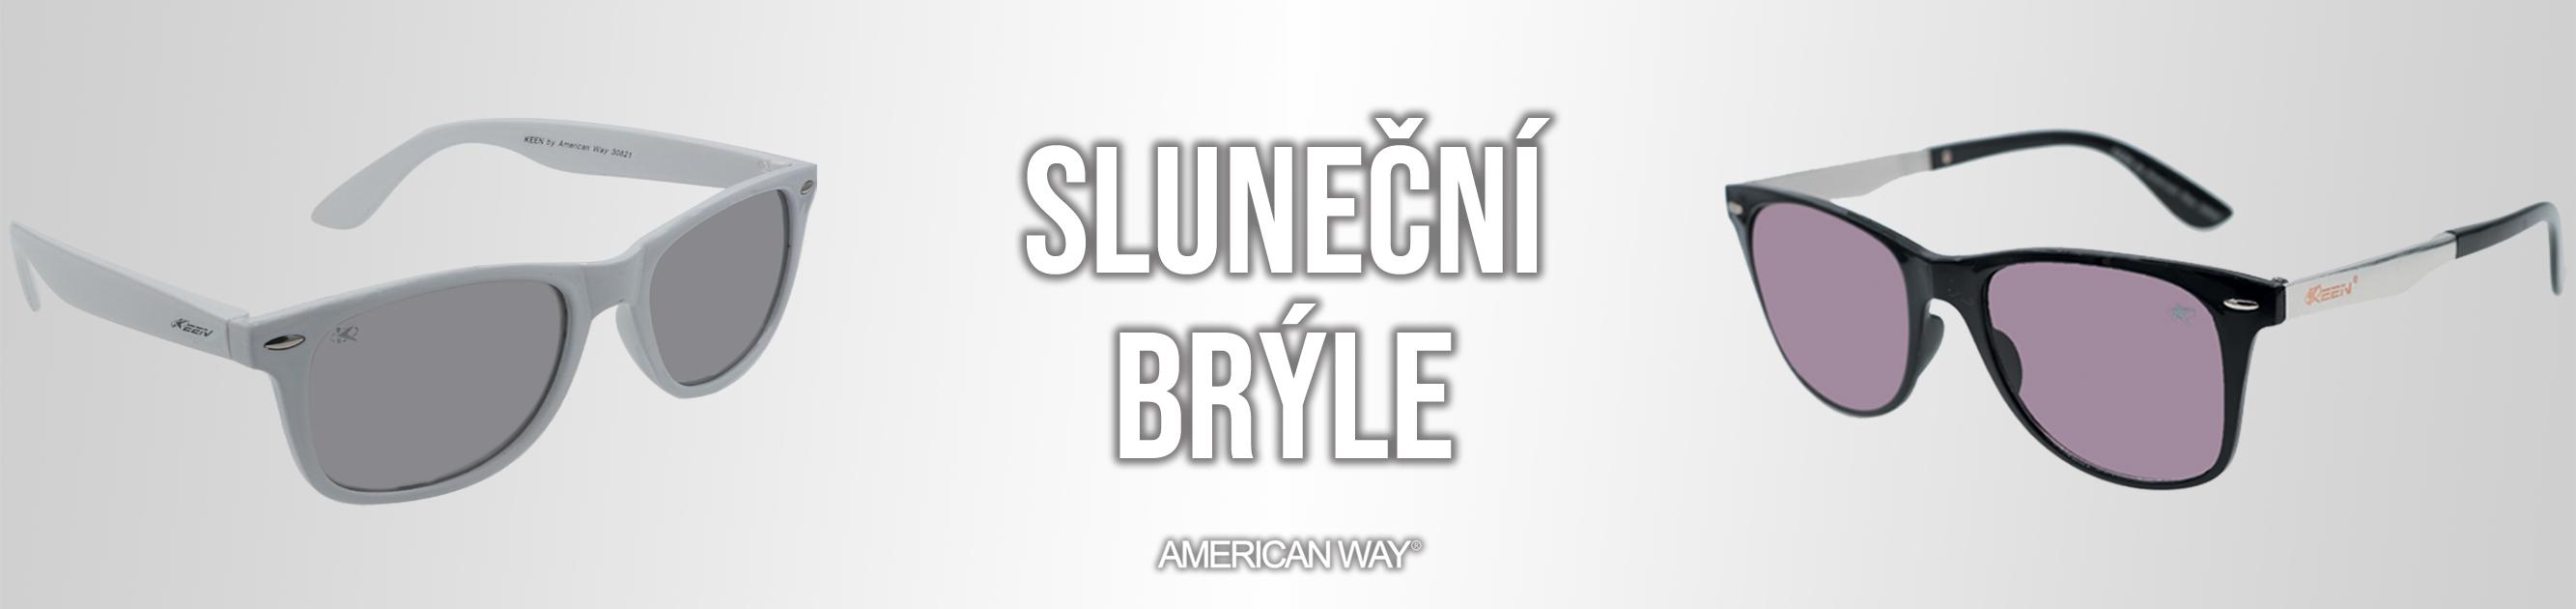 5Slunecni_cz